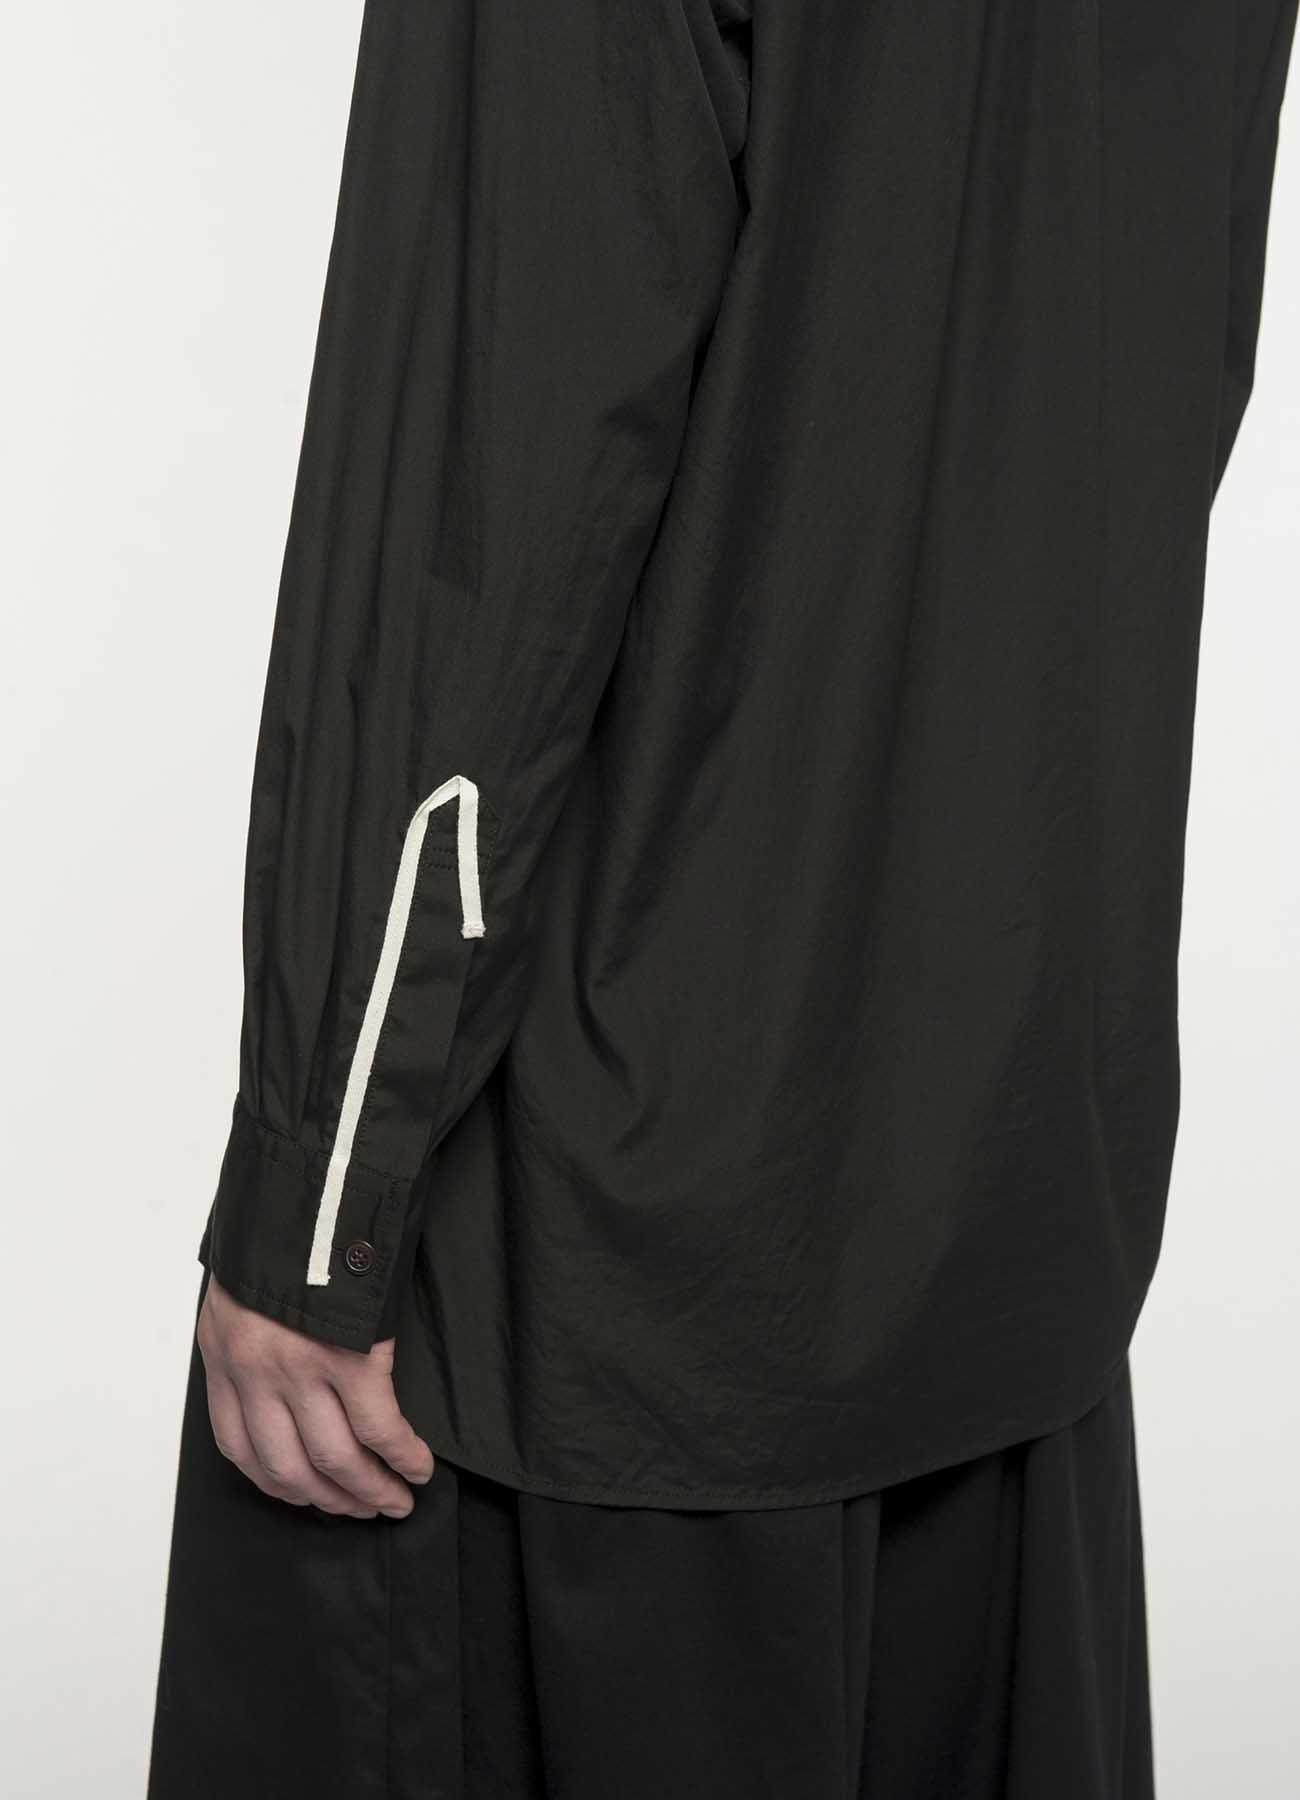 100/2 Broad Open Collar Tape Shirt